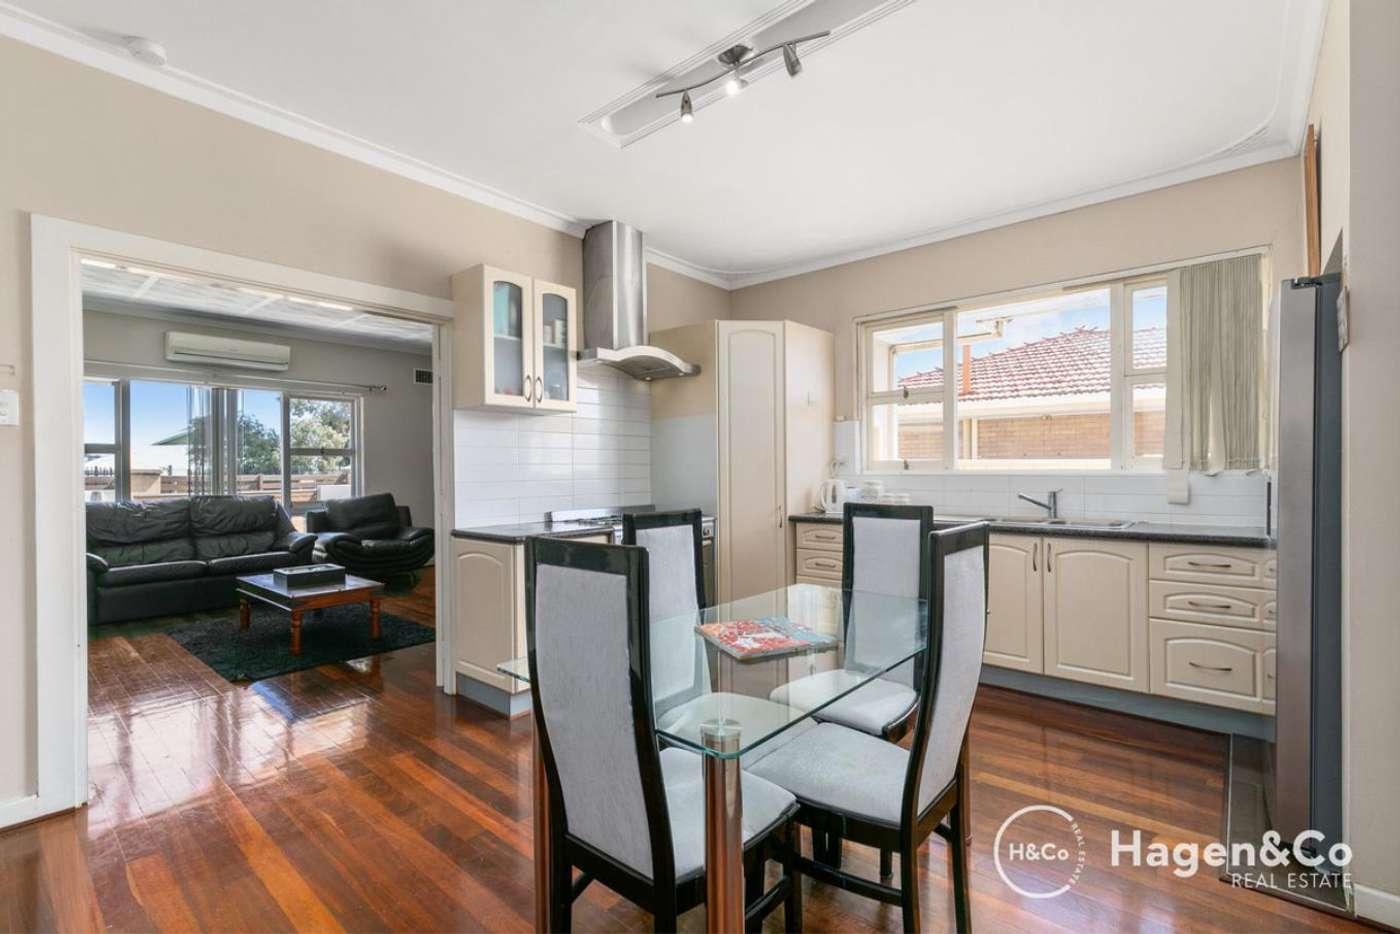 Main view of Homely house listing, 388 Main Street, Balcatta WA 6021